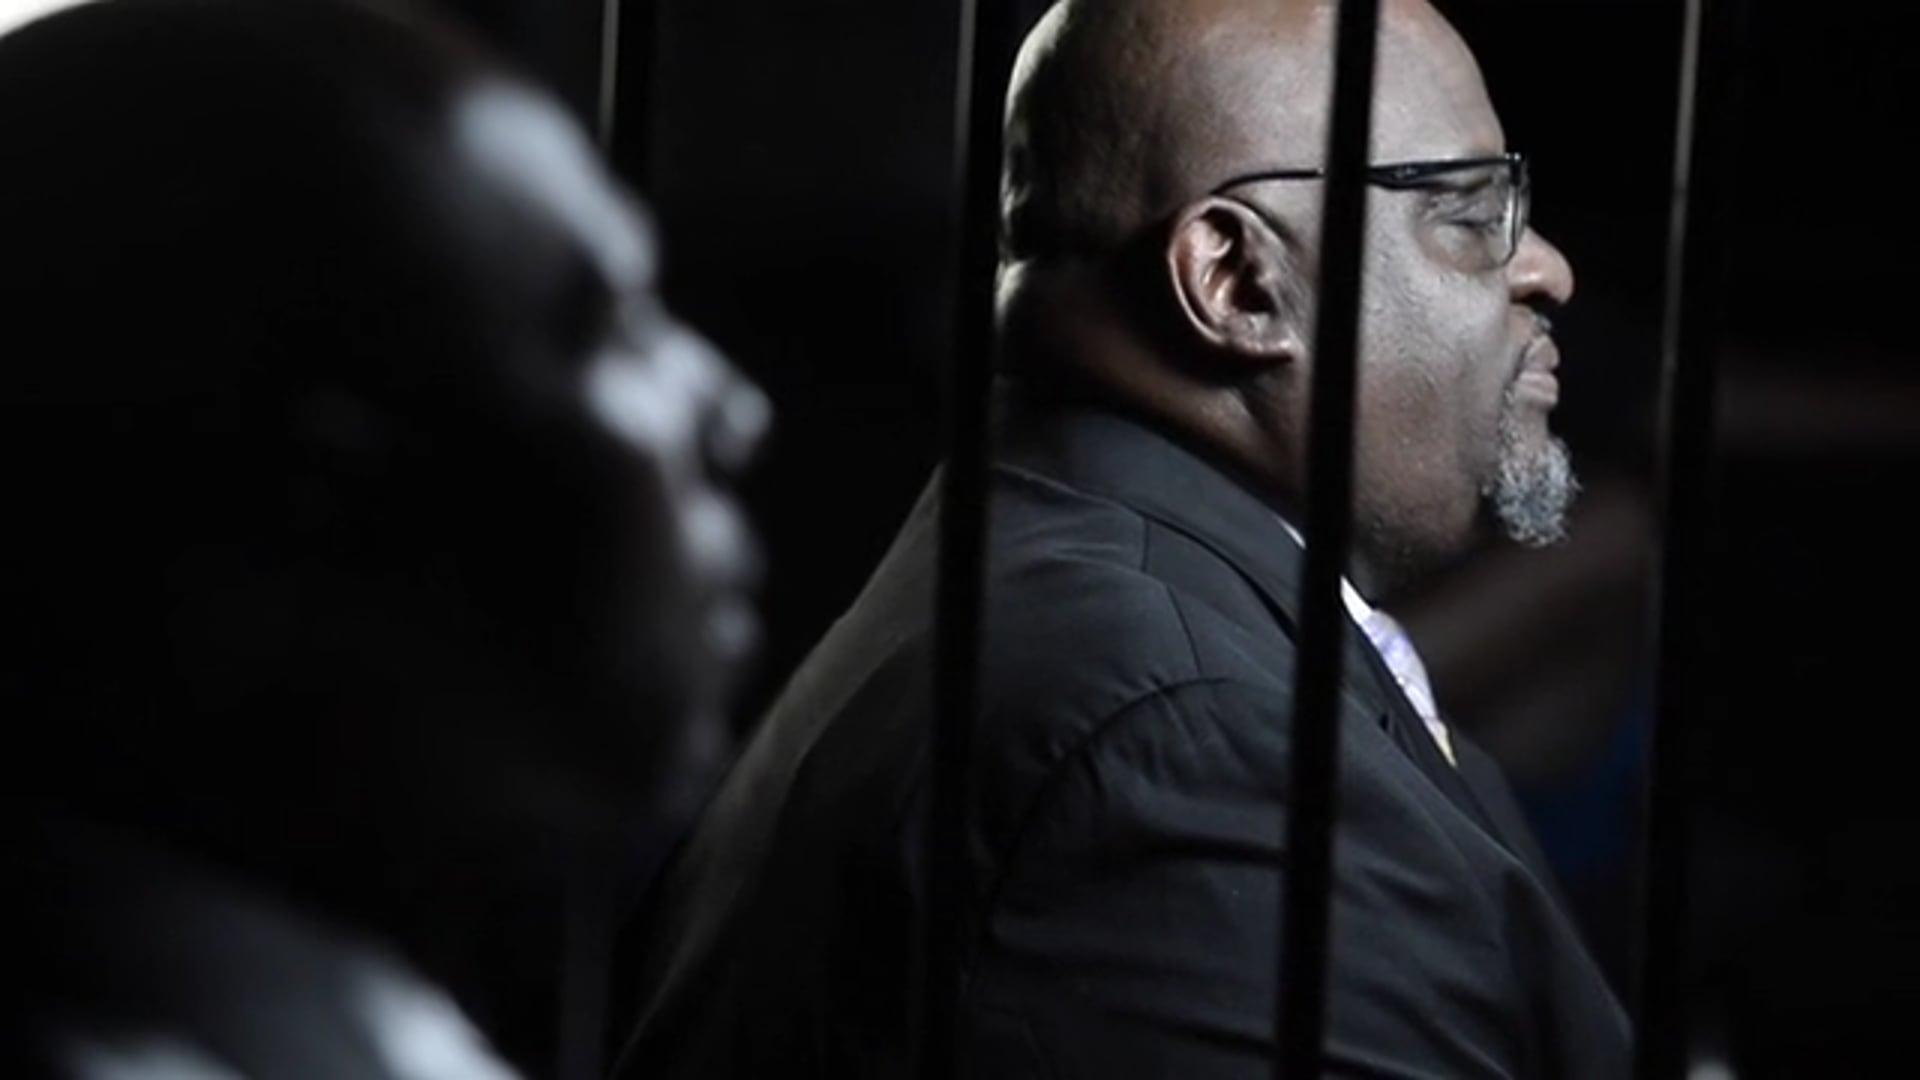 Prison Dialogues: Episode 1 -- Healing in Baltimore